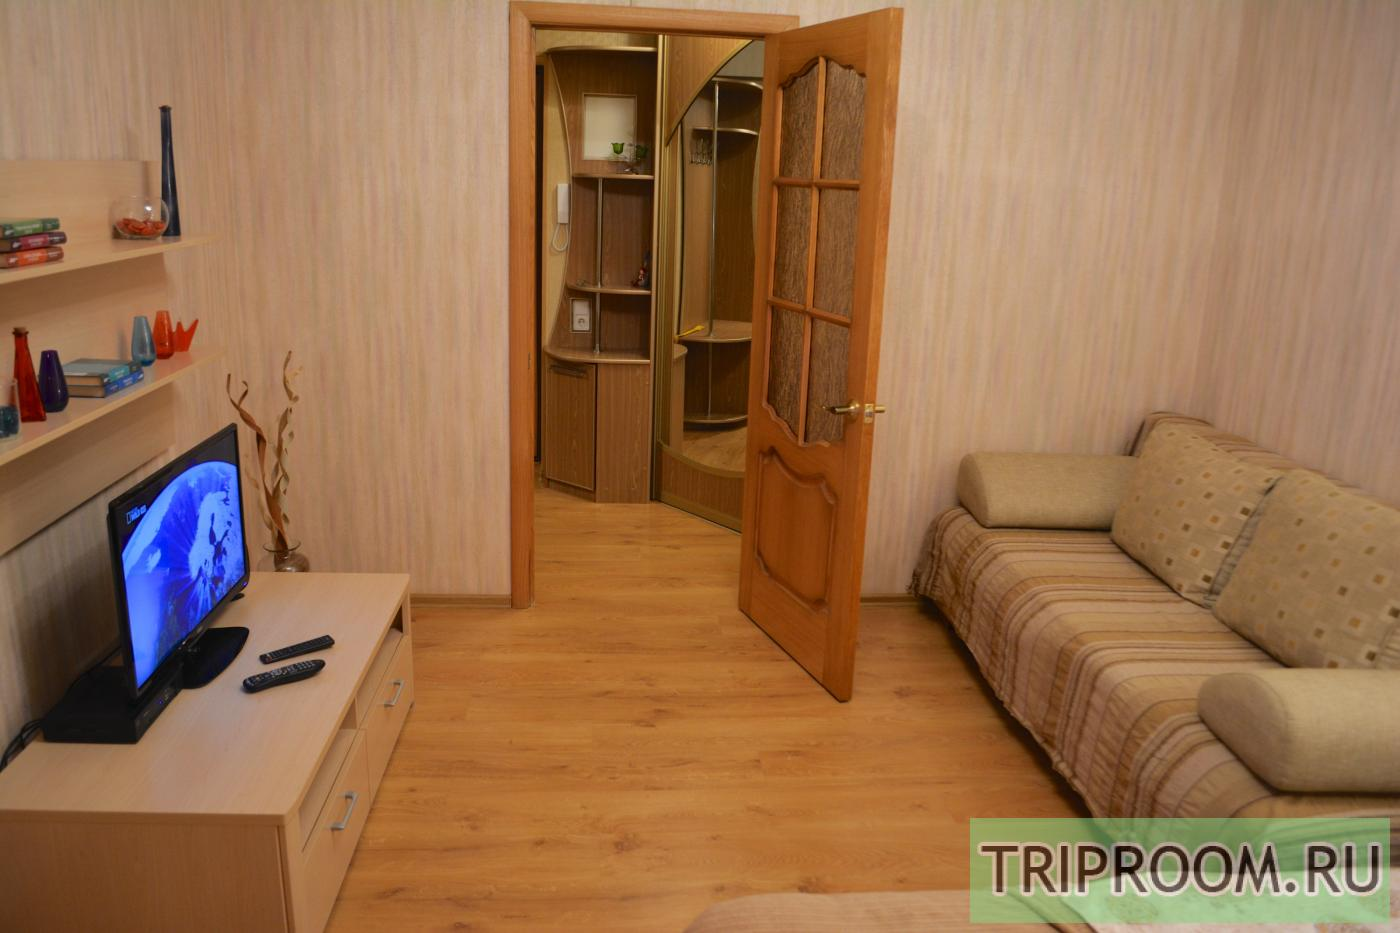 1-комнатная квартира посуточно (вариант № 5487), ул. Кропоткина улица, фото № 3